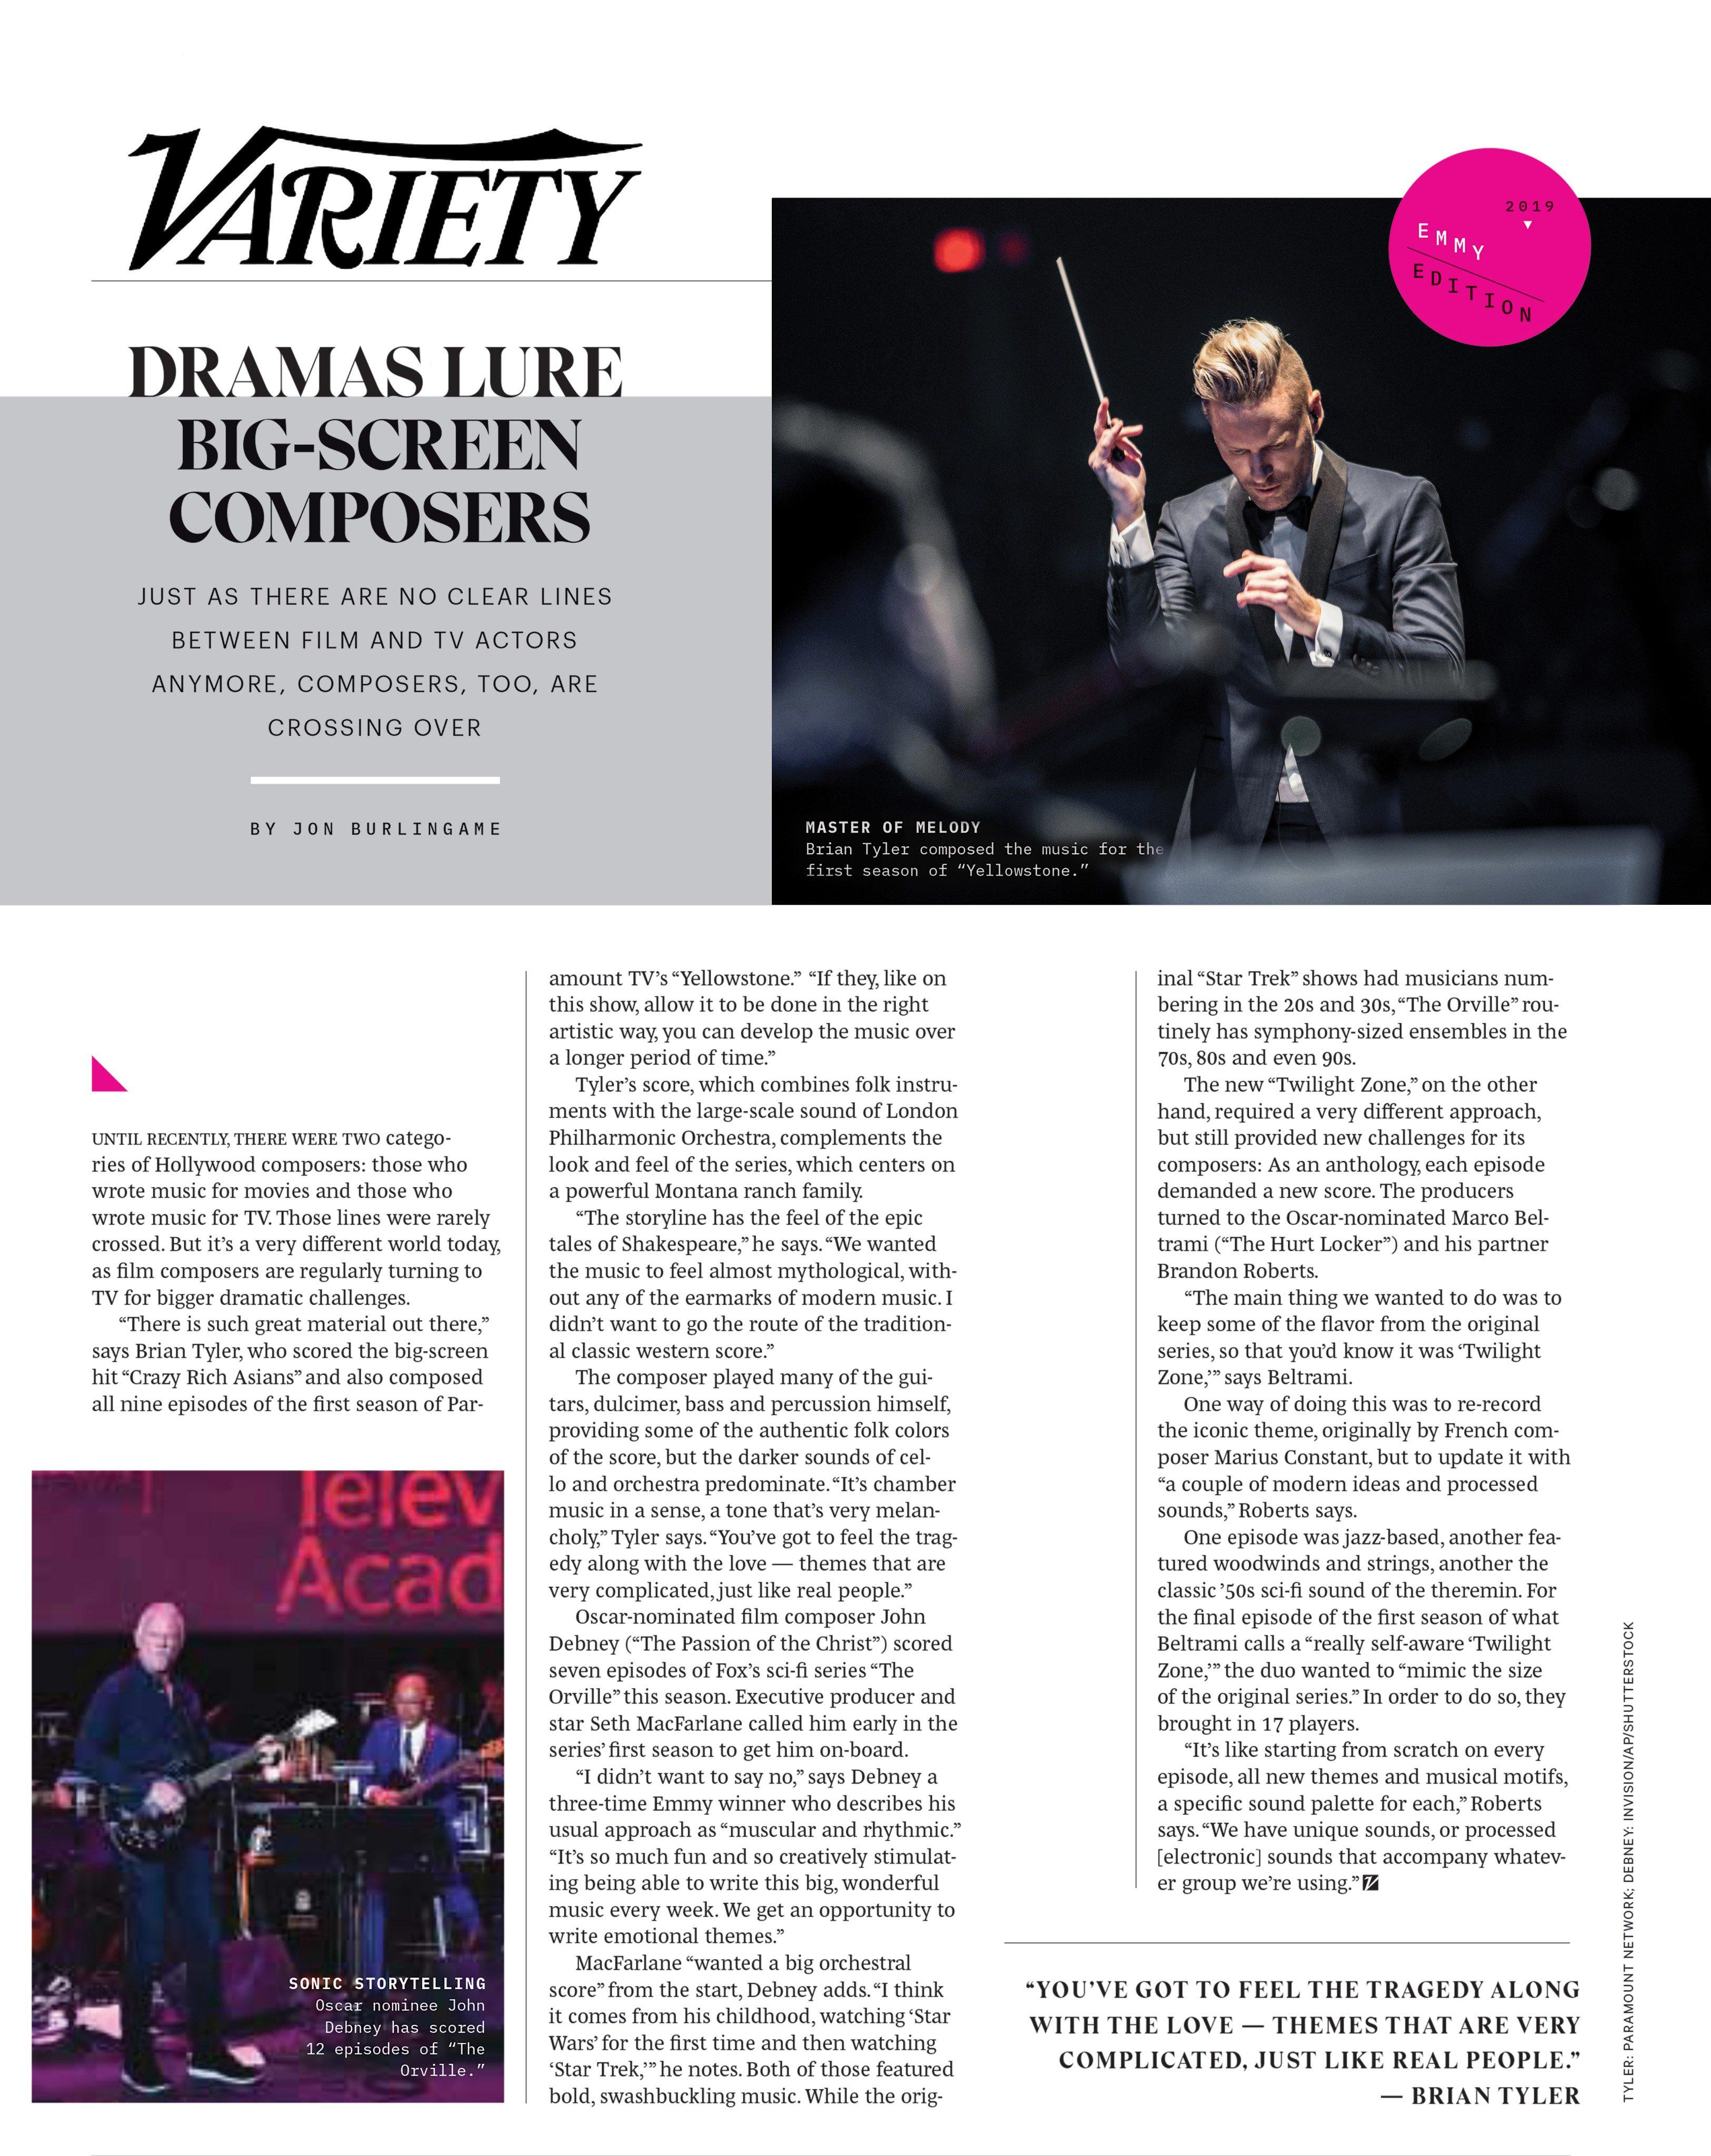 Variety Jun 2019